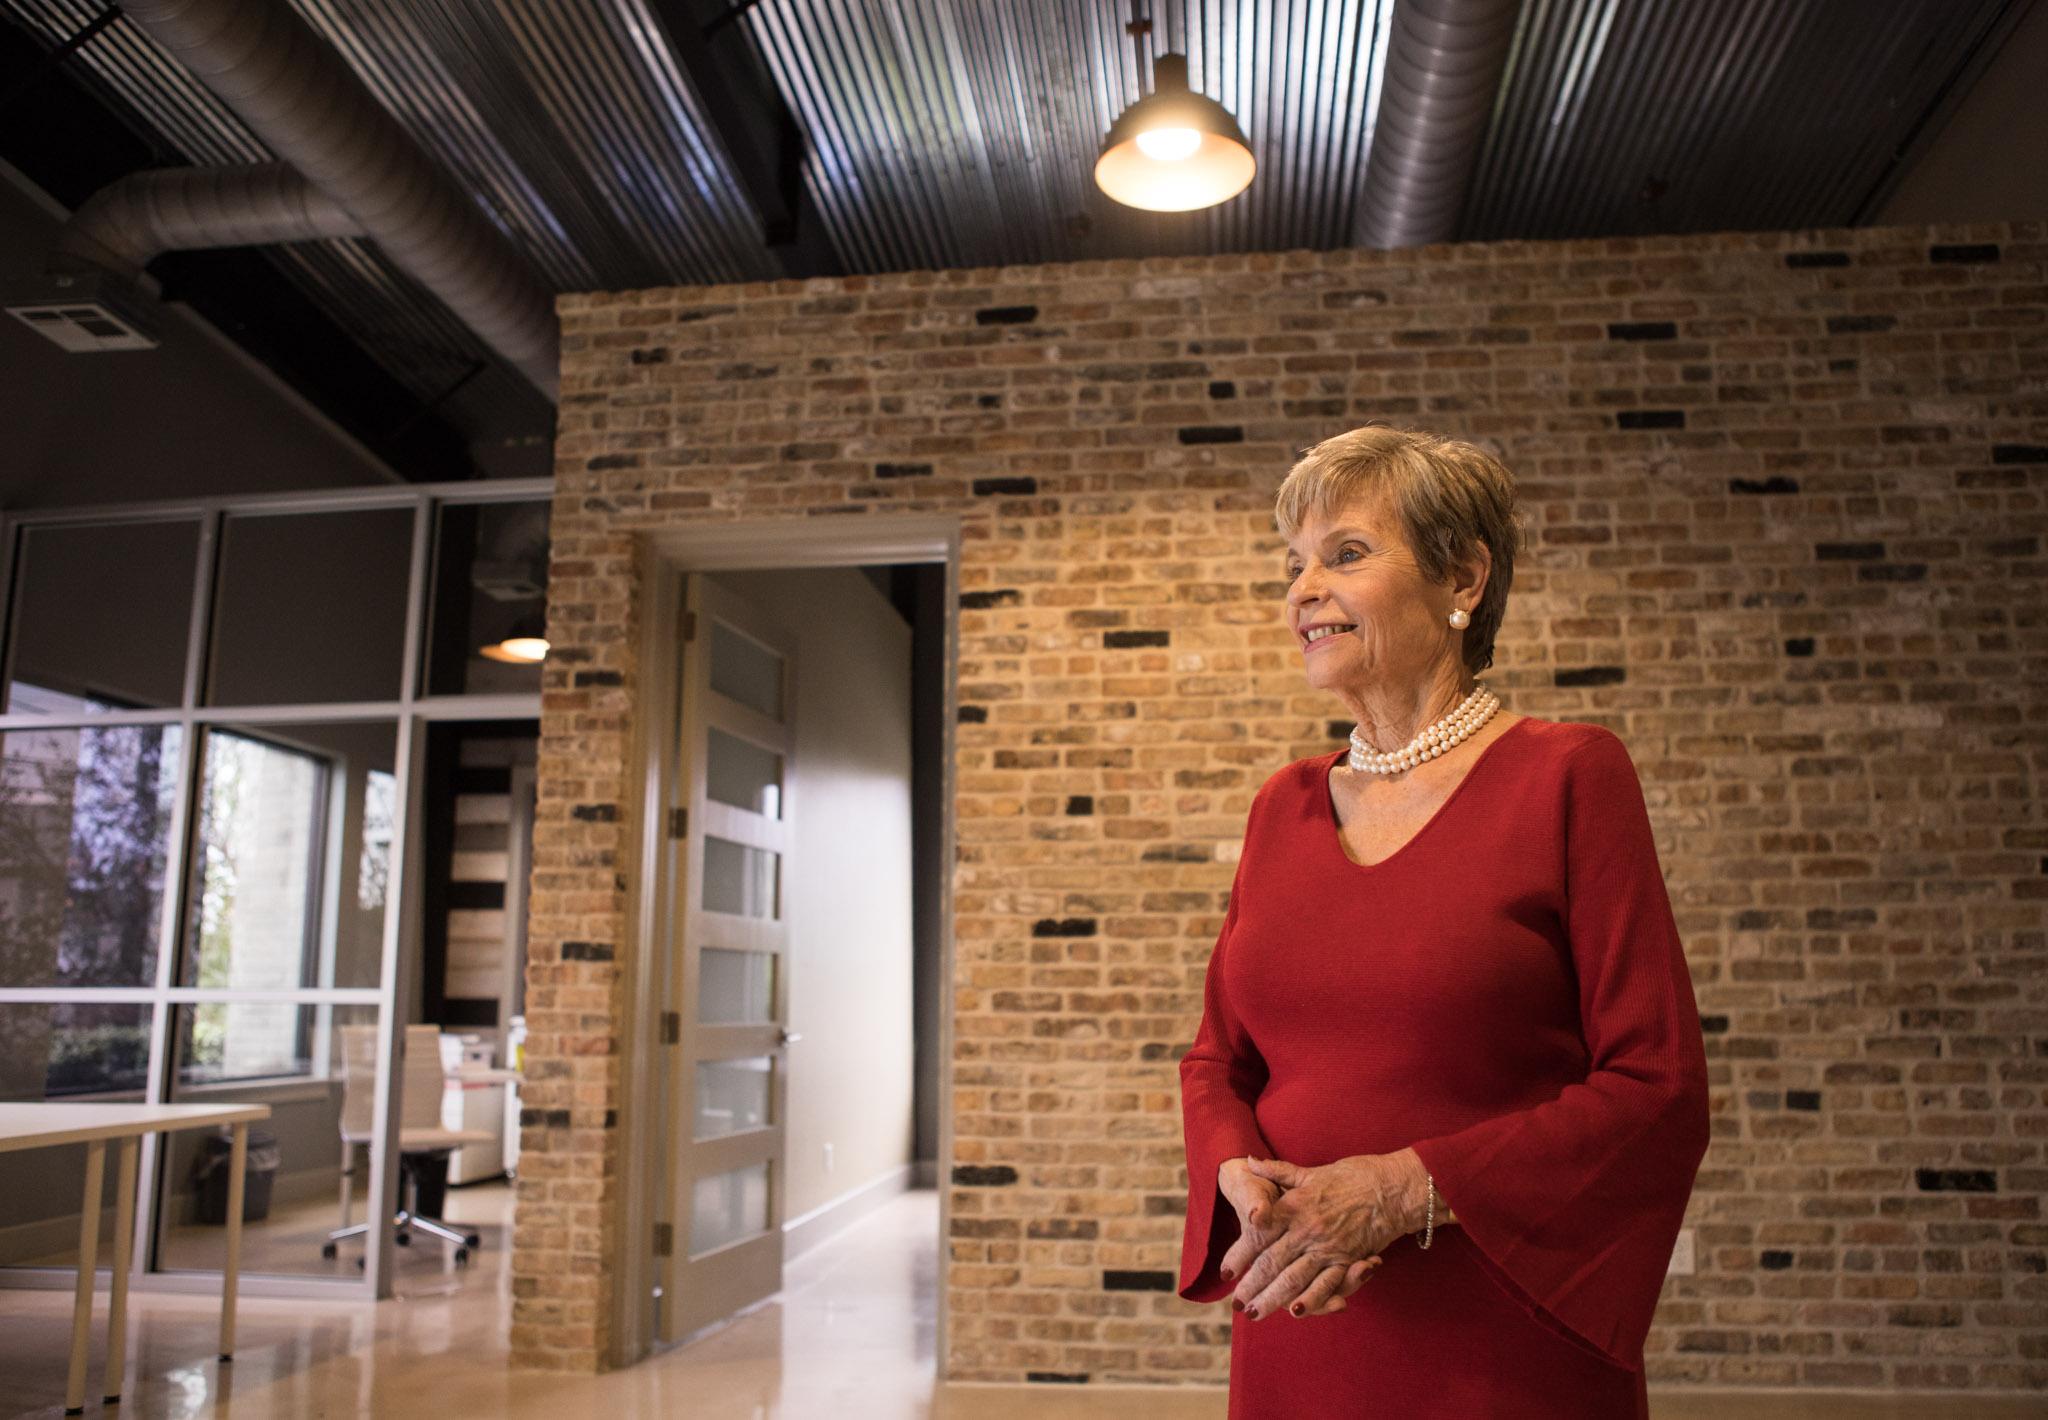 Biomedical Development Corporation Founder Phyllis Siegel walks through her office on East Dewey Place.